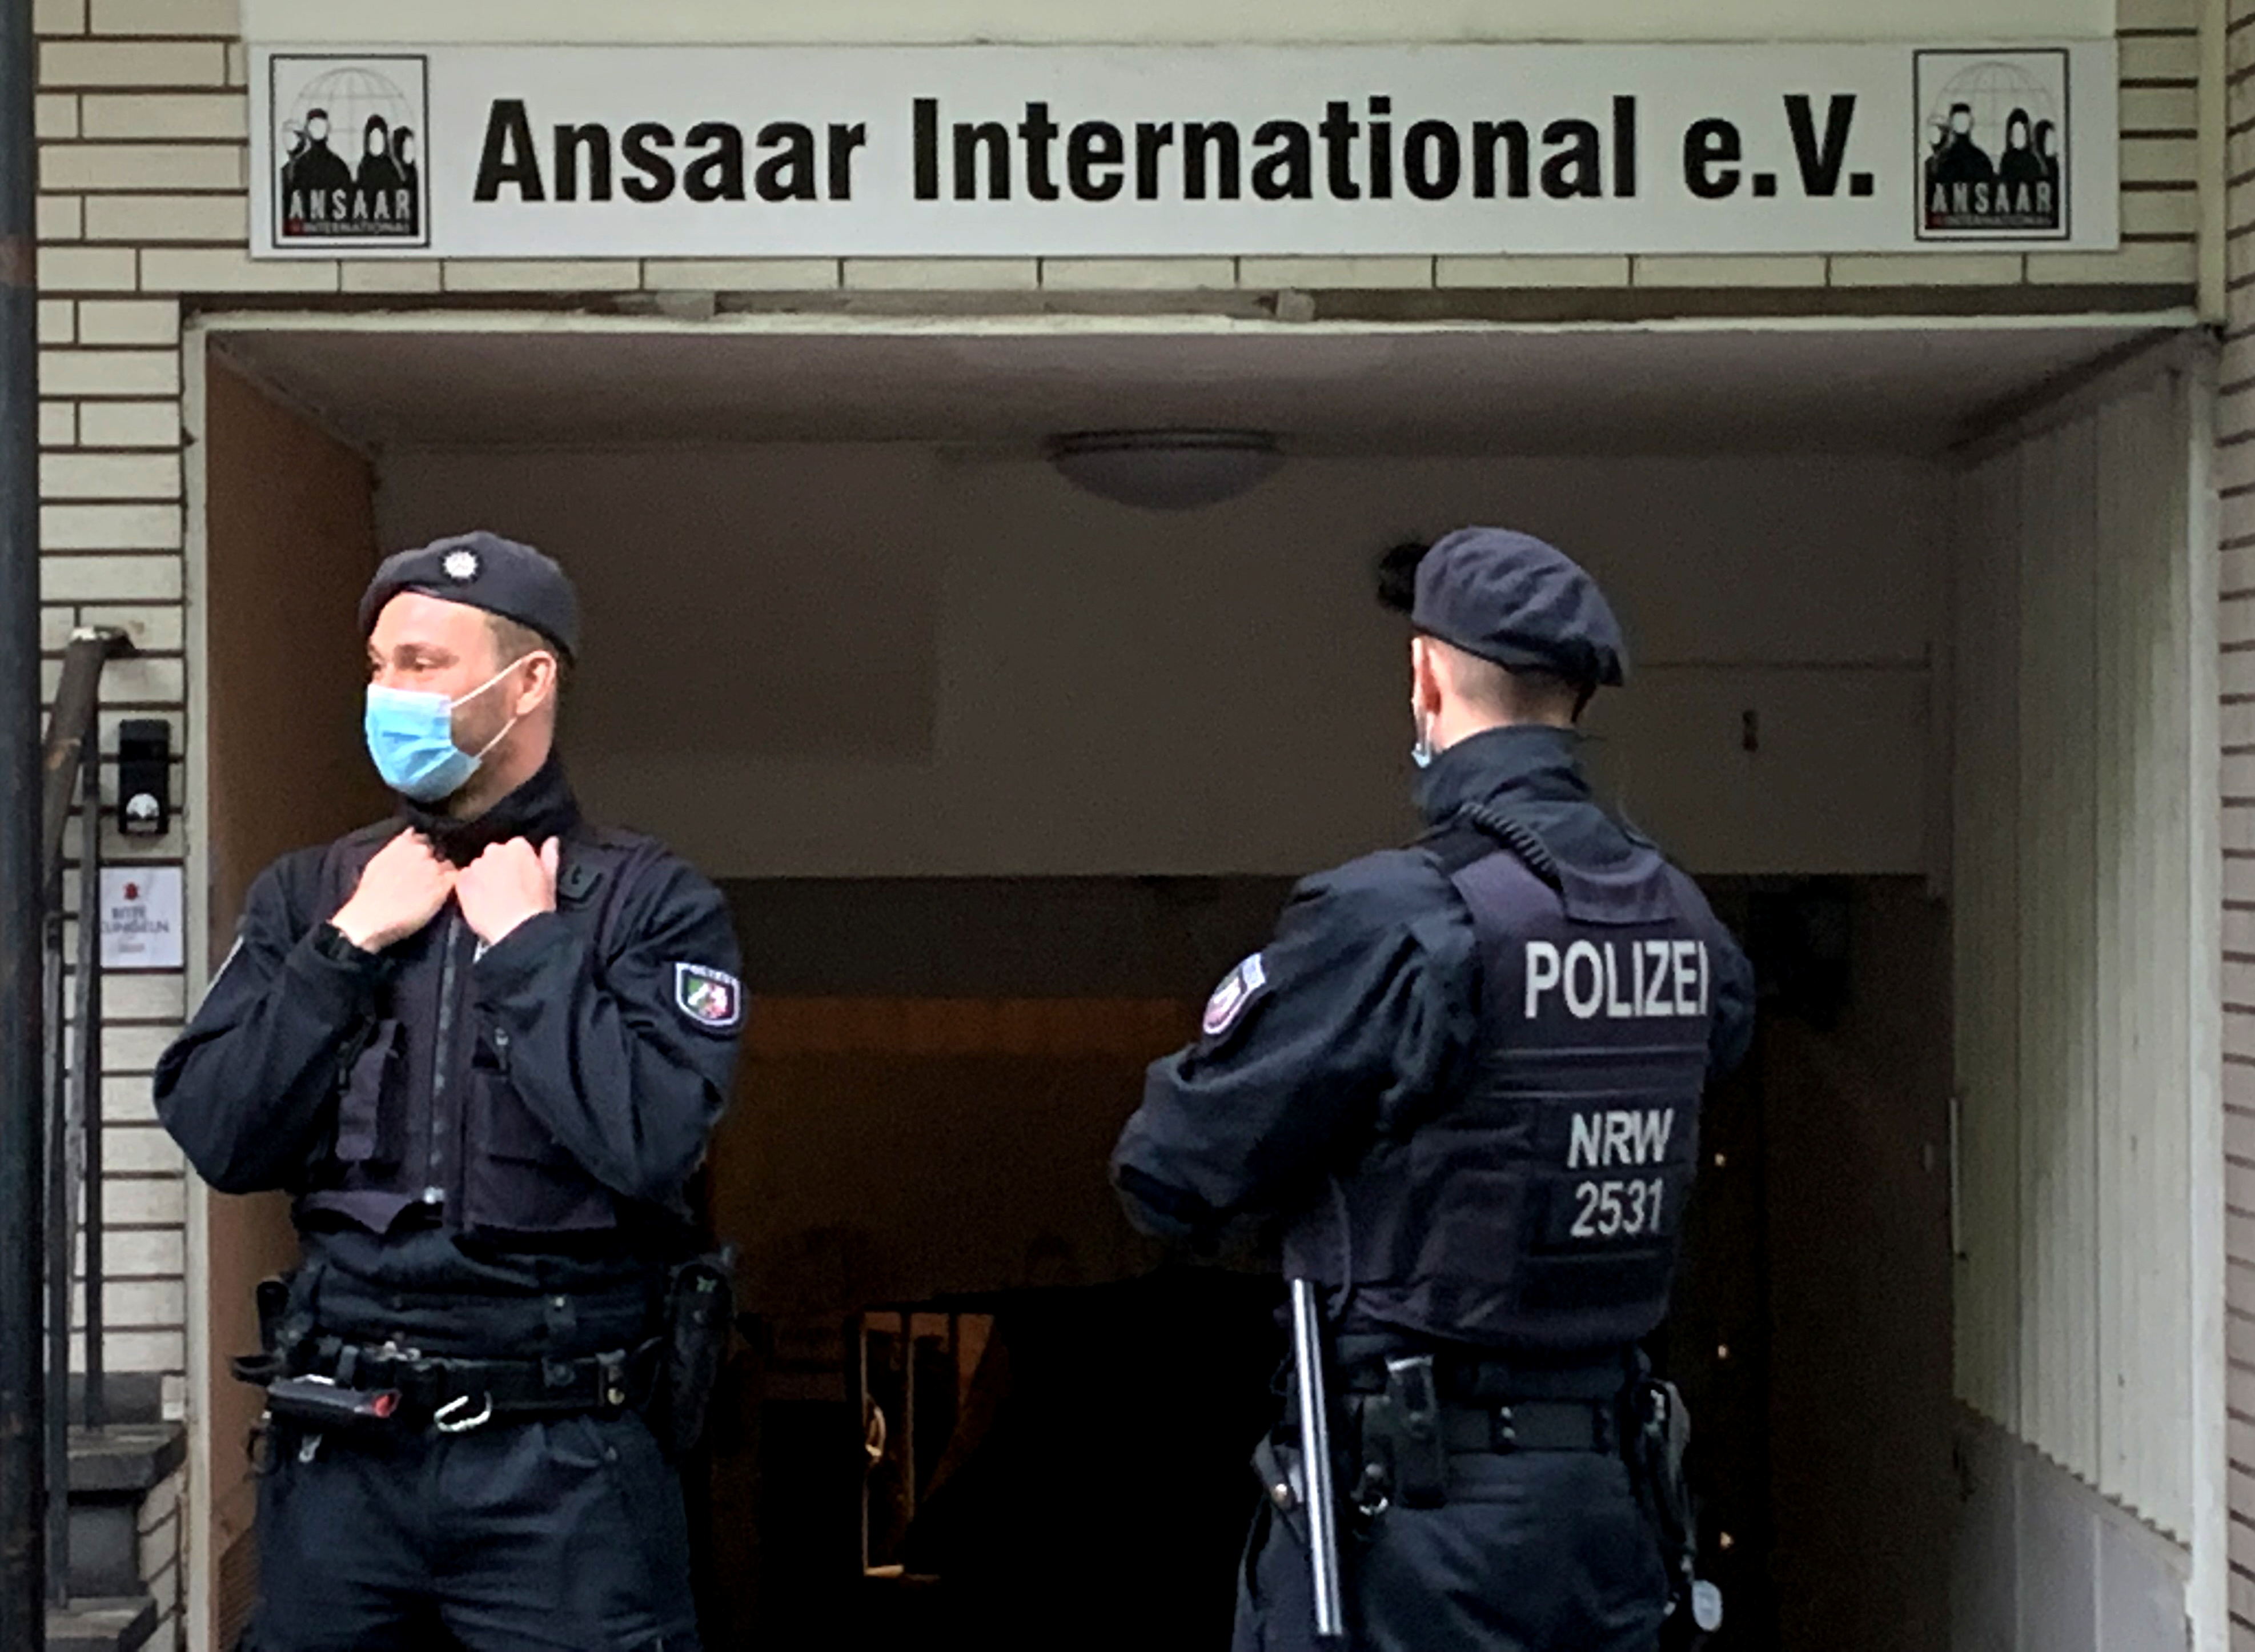 Germany bans Islamic group Ansaar over terrorism financing suspicions |  Reuters